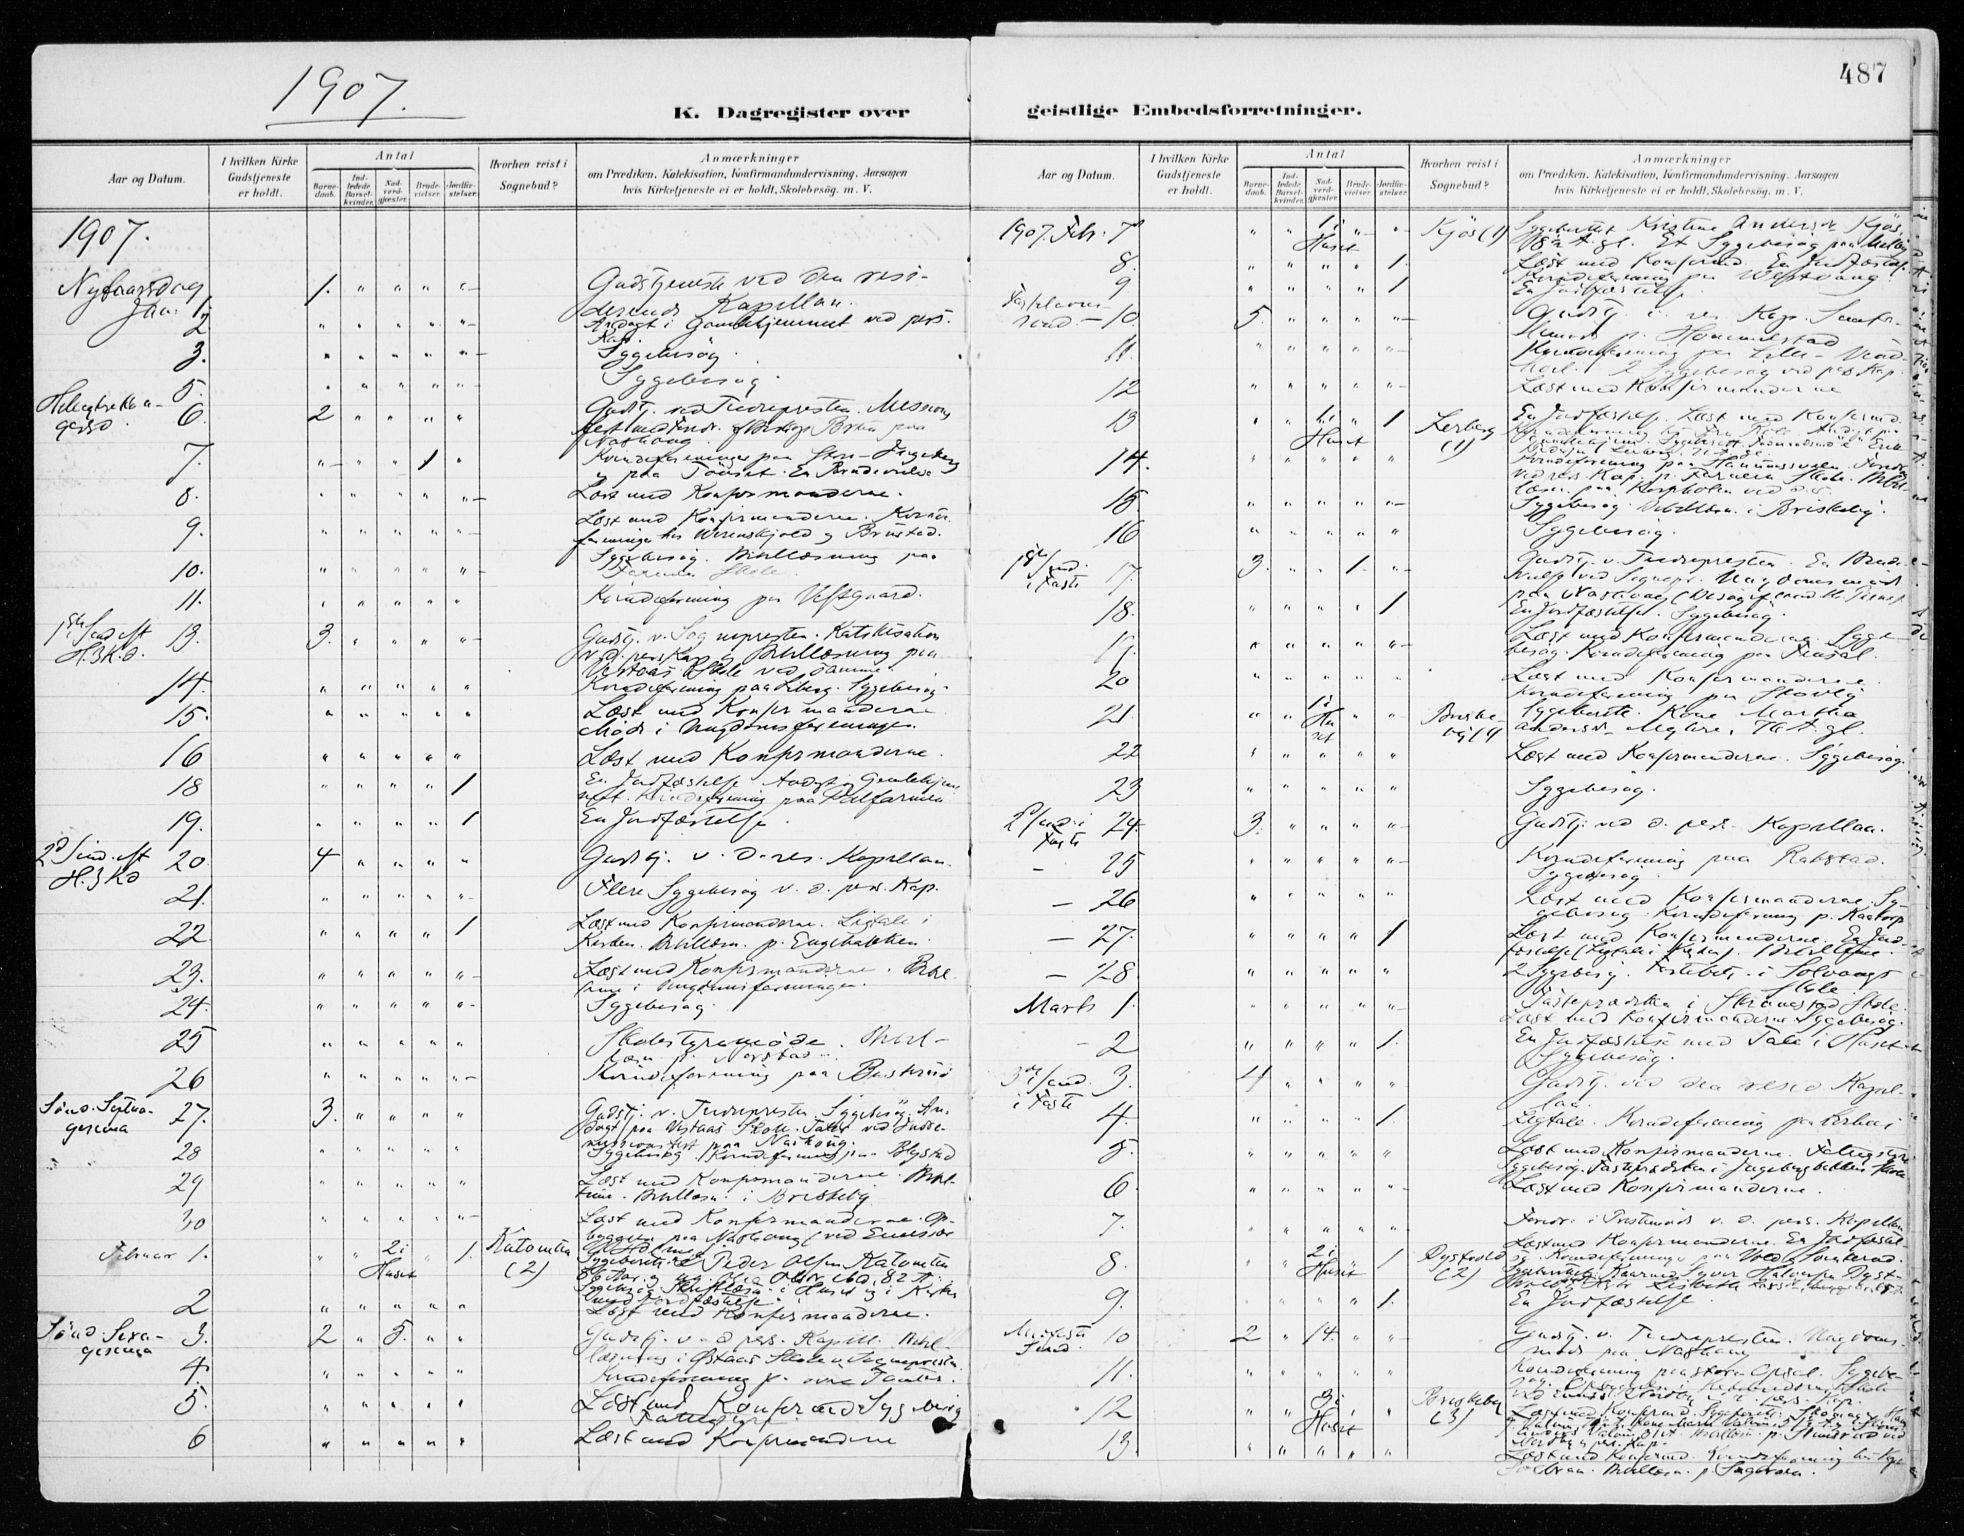 SAH, Vang prestekontor, Hedmark, H/Ha/Haa/L0021: Parish register (official) no. 21, 1902-1917, p. 487